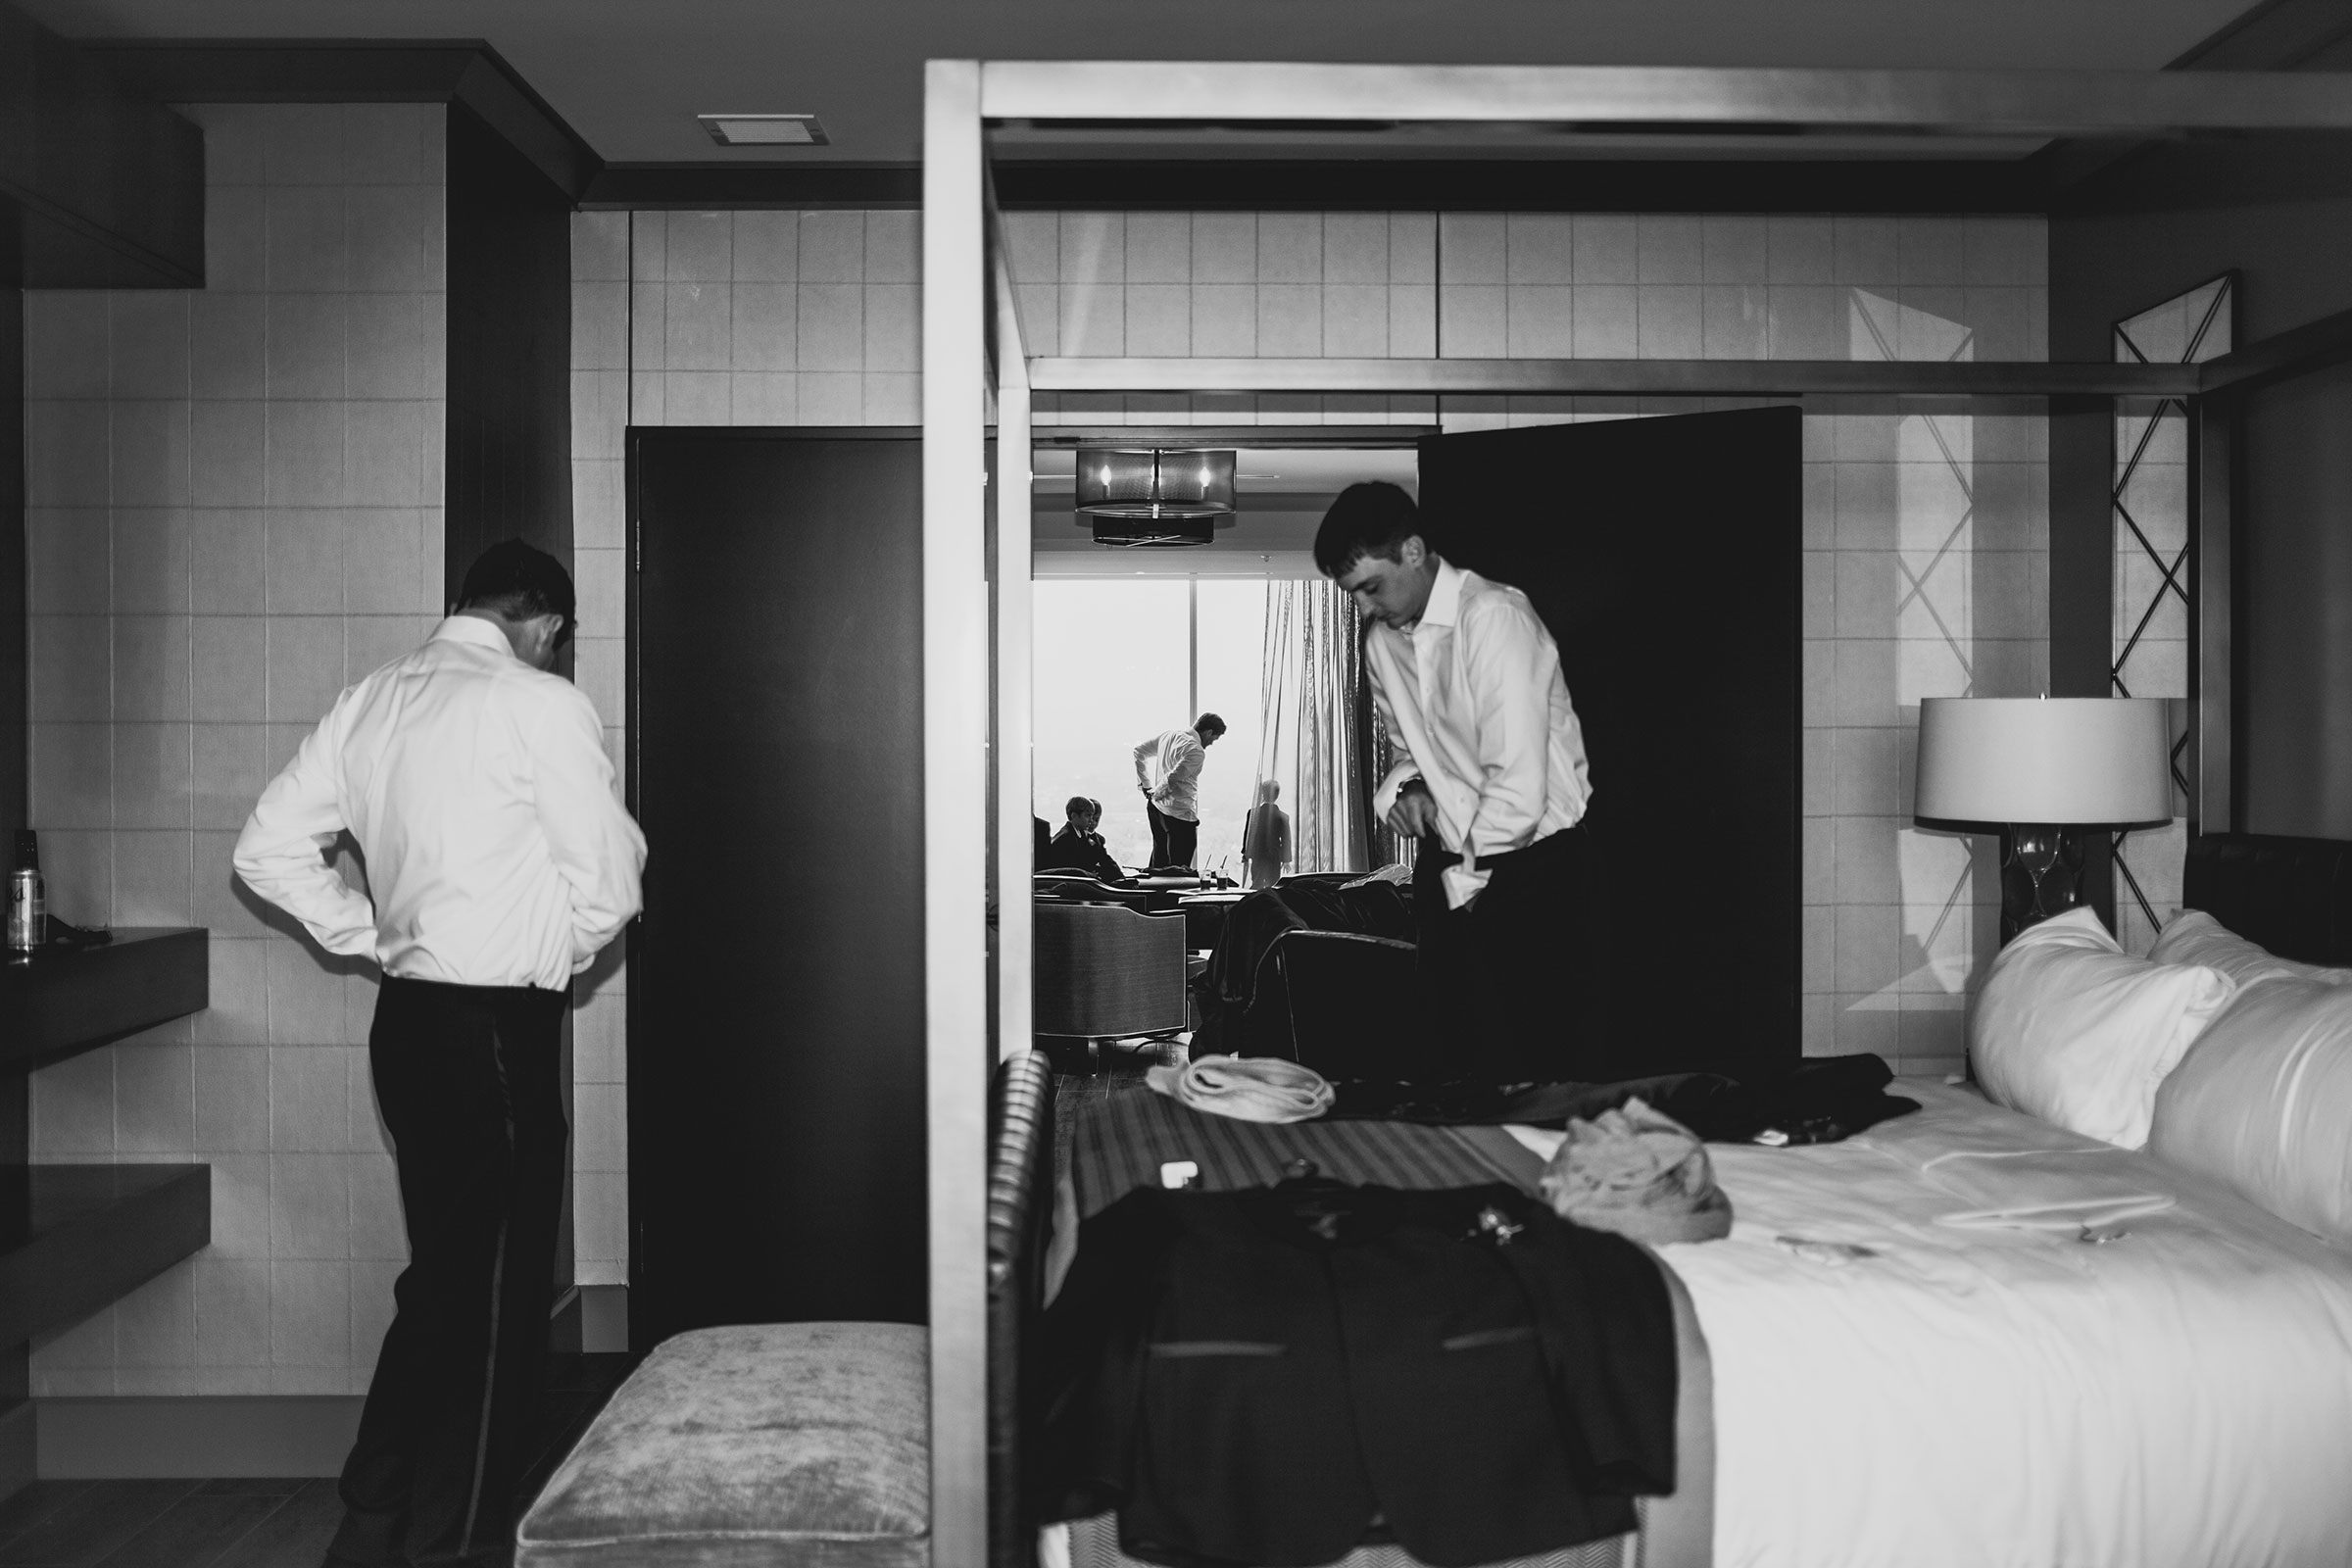 groom-and-groomsmen-getting-ready-hilton-omaha-nebraska-raelyn-ramey-photography.jpg